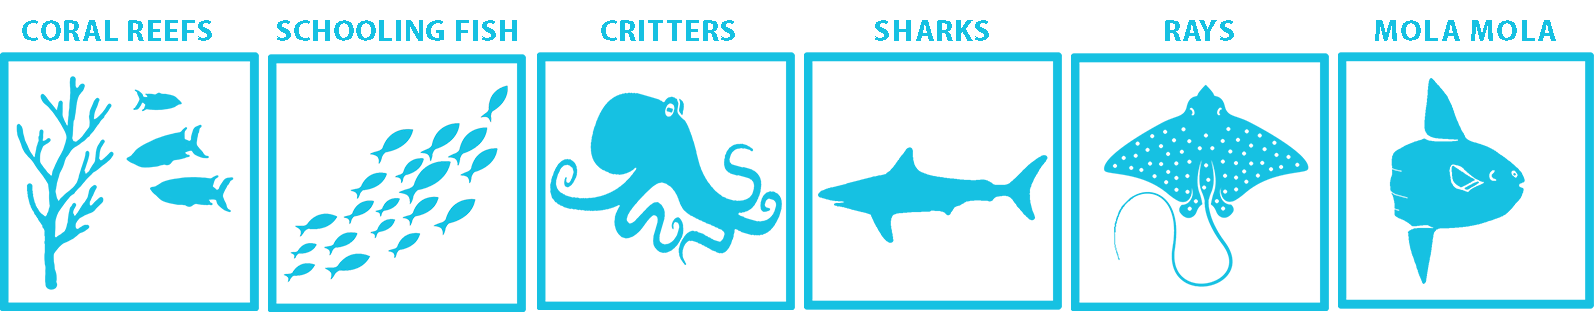 Alor Marine life guide